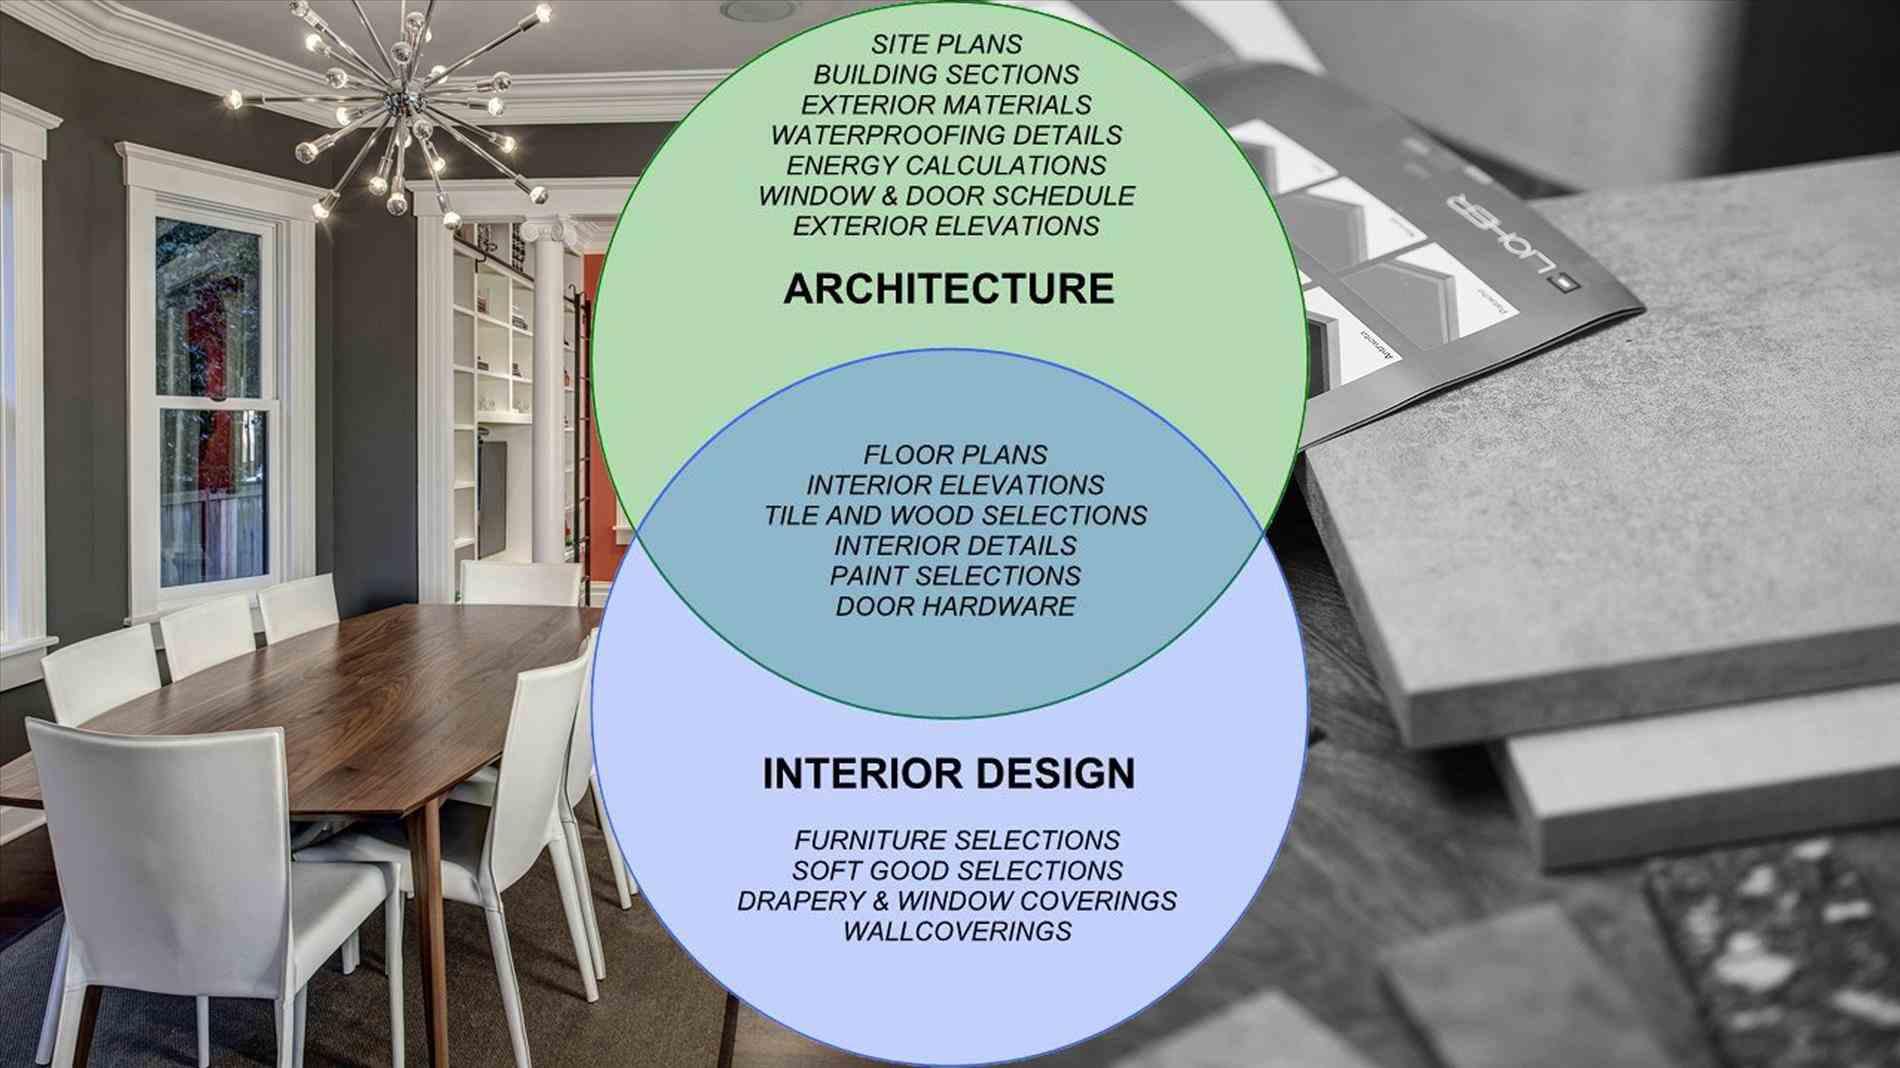 board-vellumrhboardandvellumcom-archives-page-of-architects-and-rhmetaskapescom-design-interior-designing-career-scope-archives-page-of-architects-and-rhmetaskapescom-best-cad